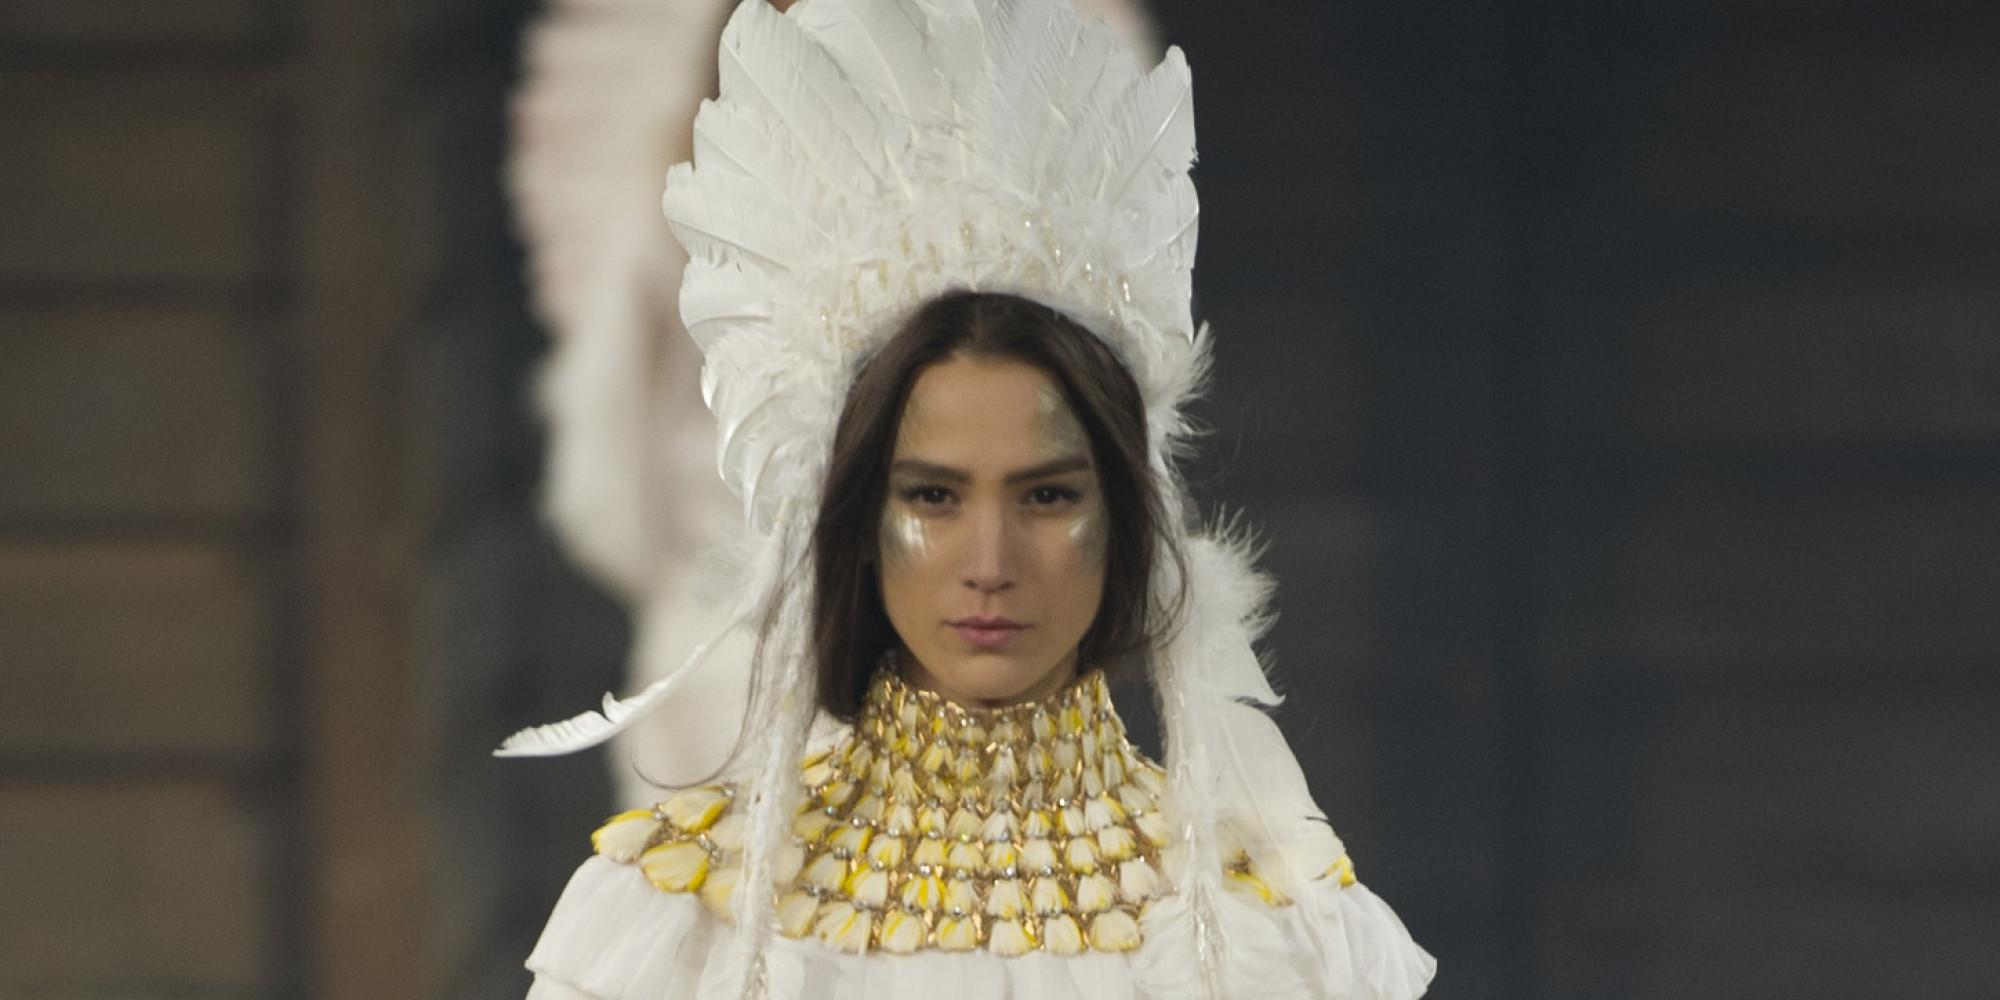 chanel u0027s native american headdress on runway raises eyebrows